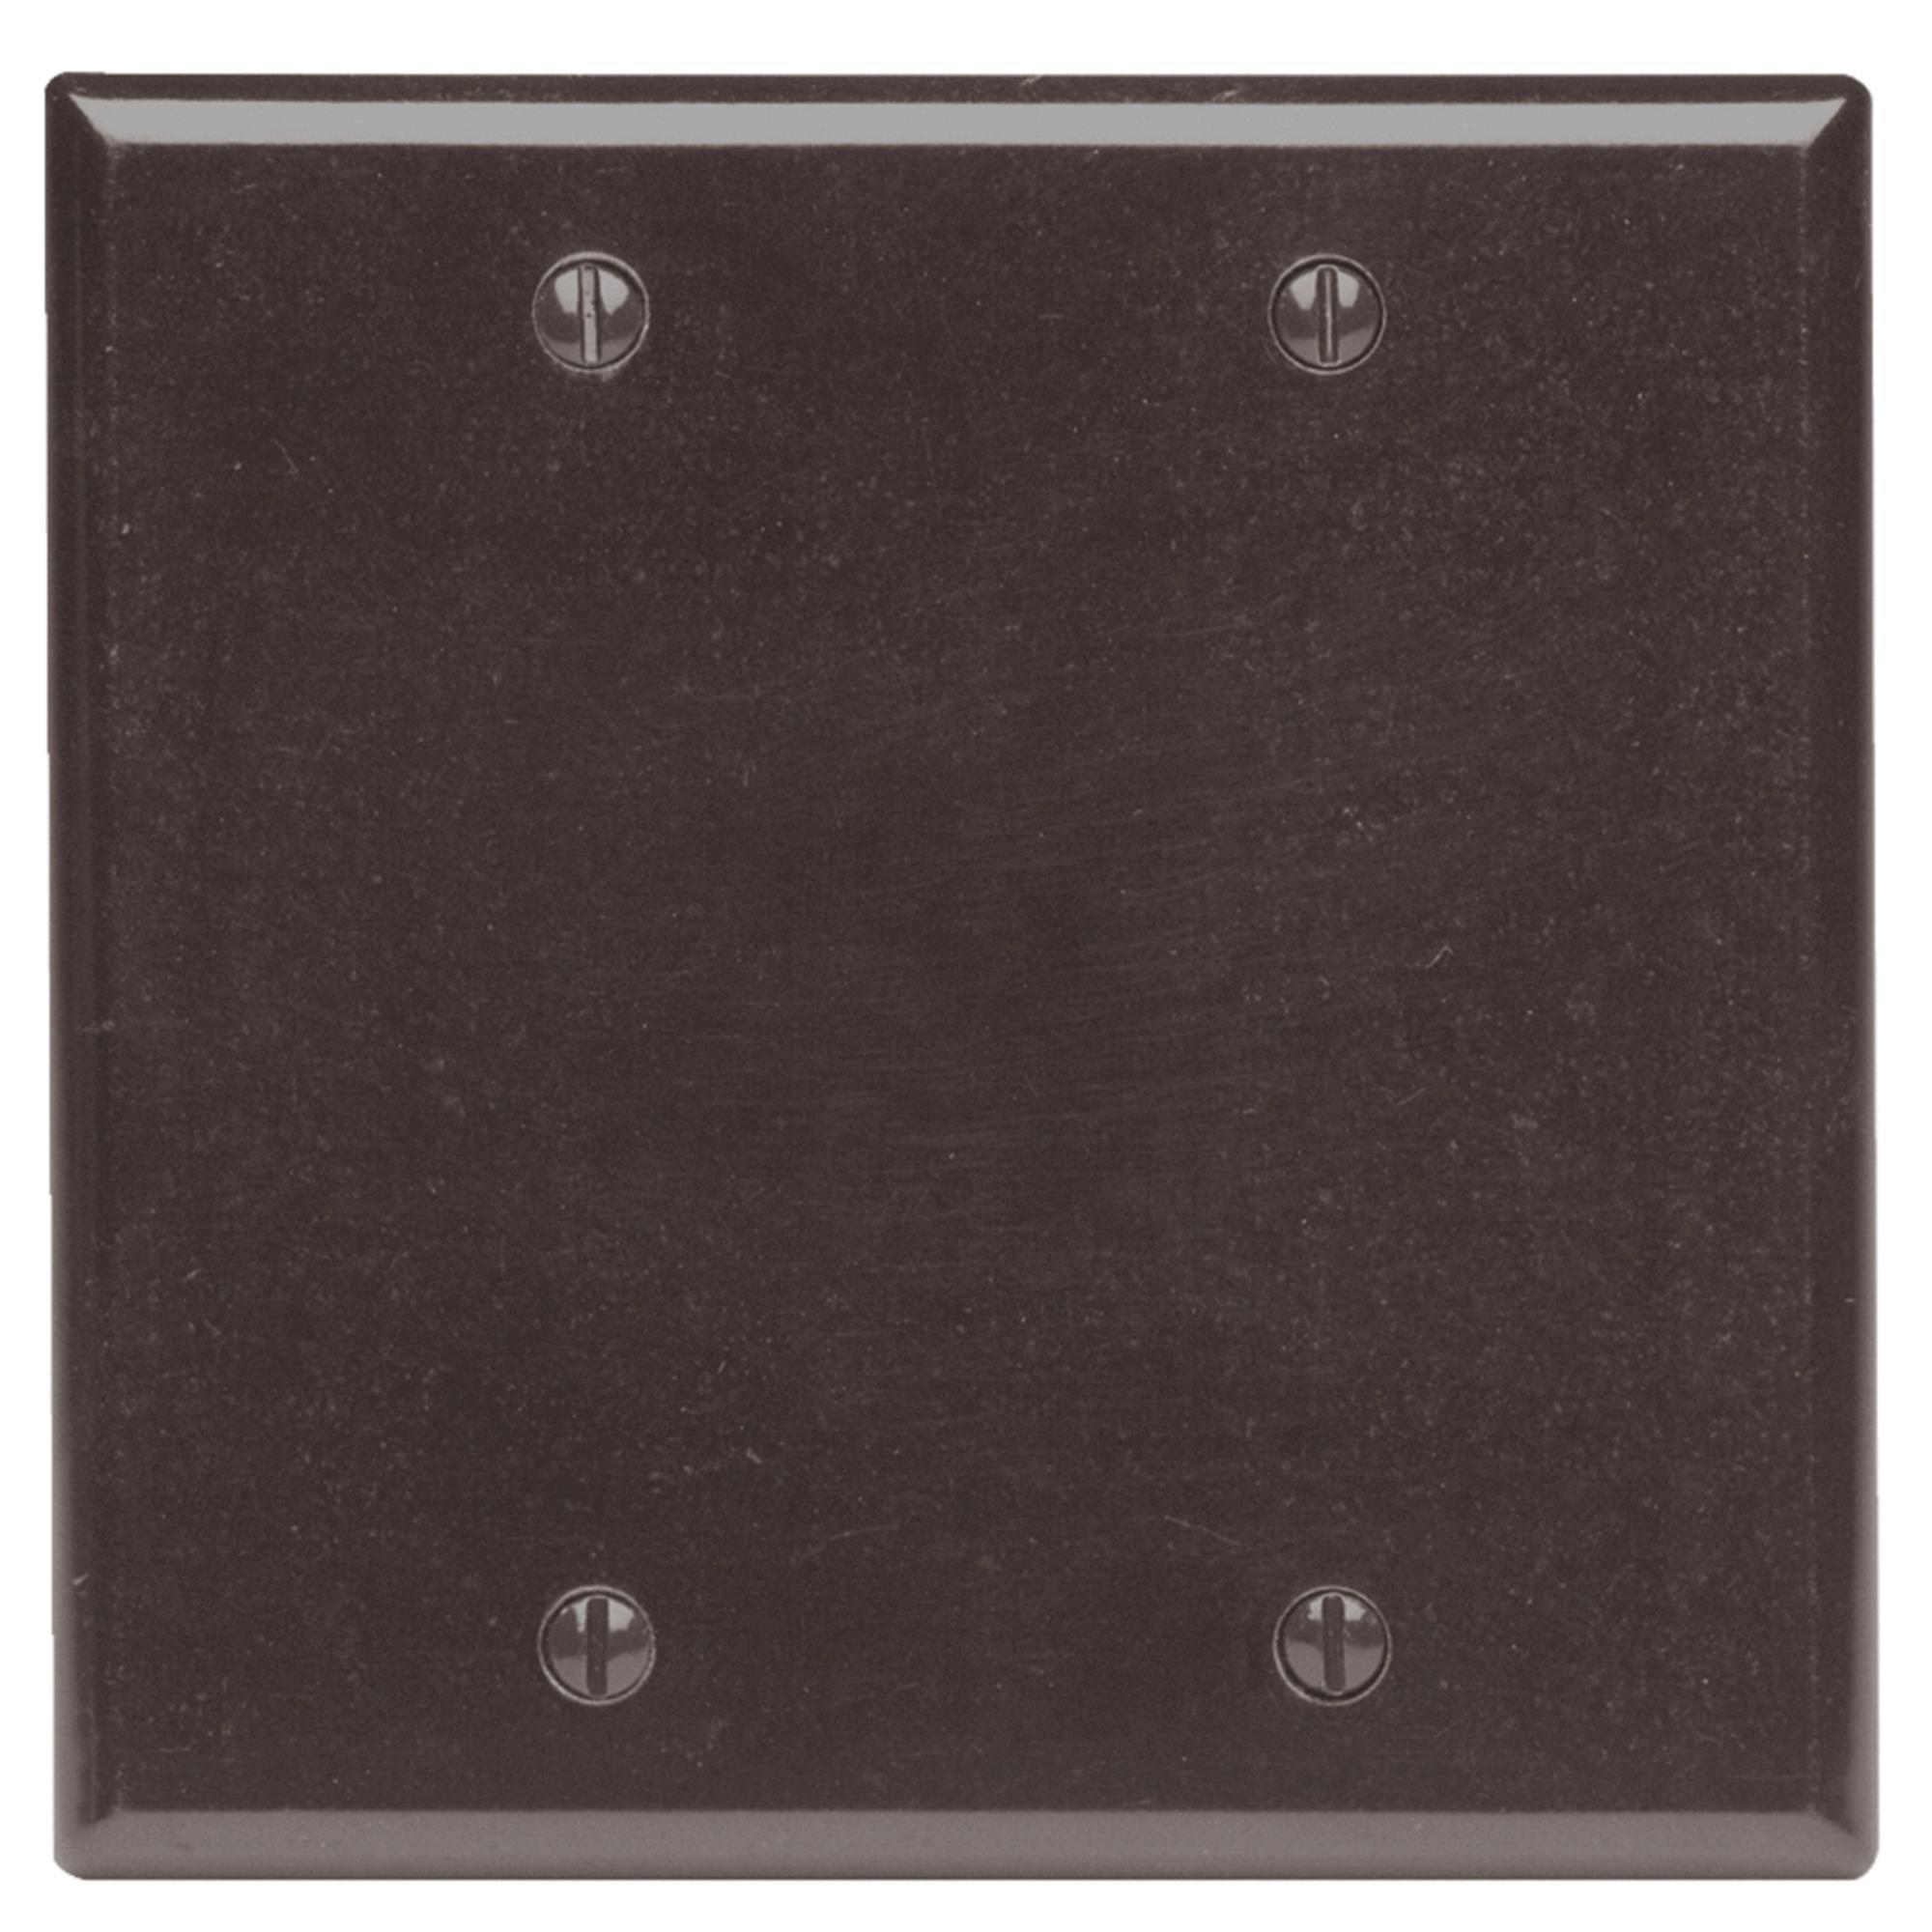 Leviton Thermoset Blank Wall Plate